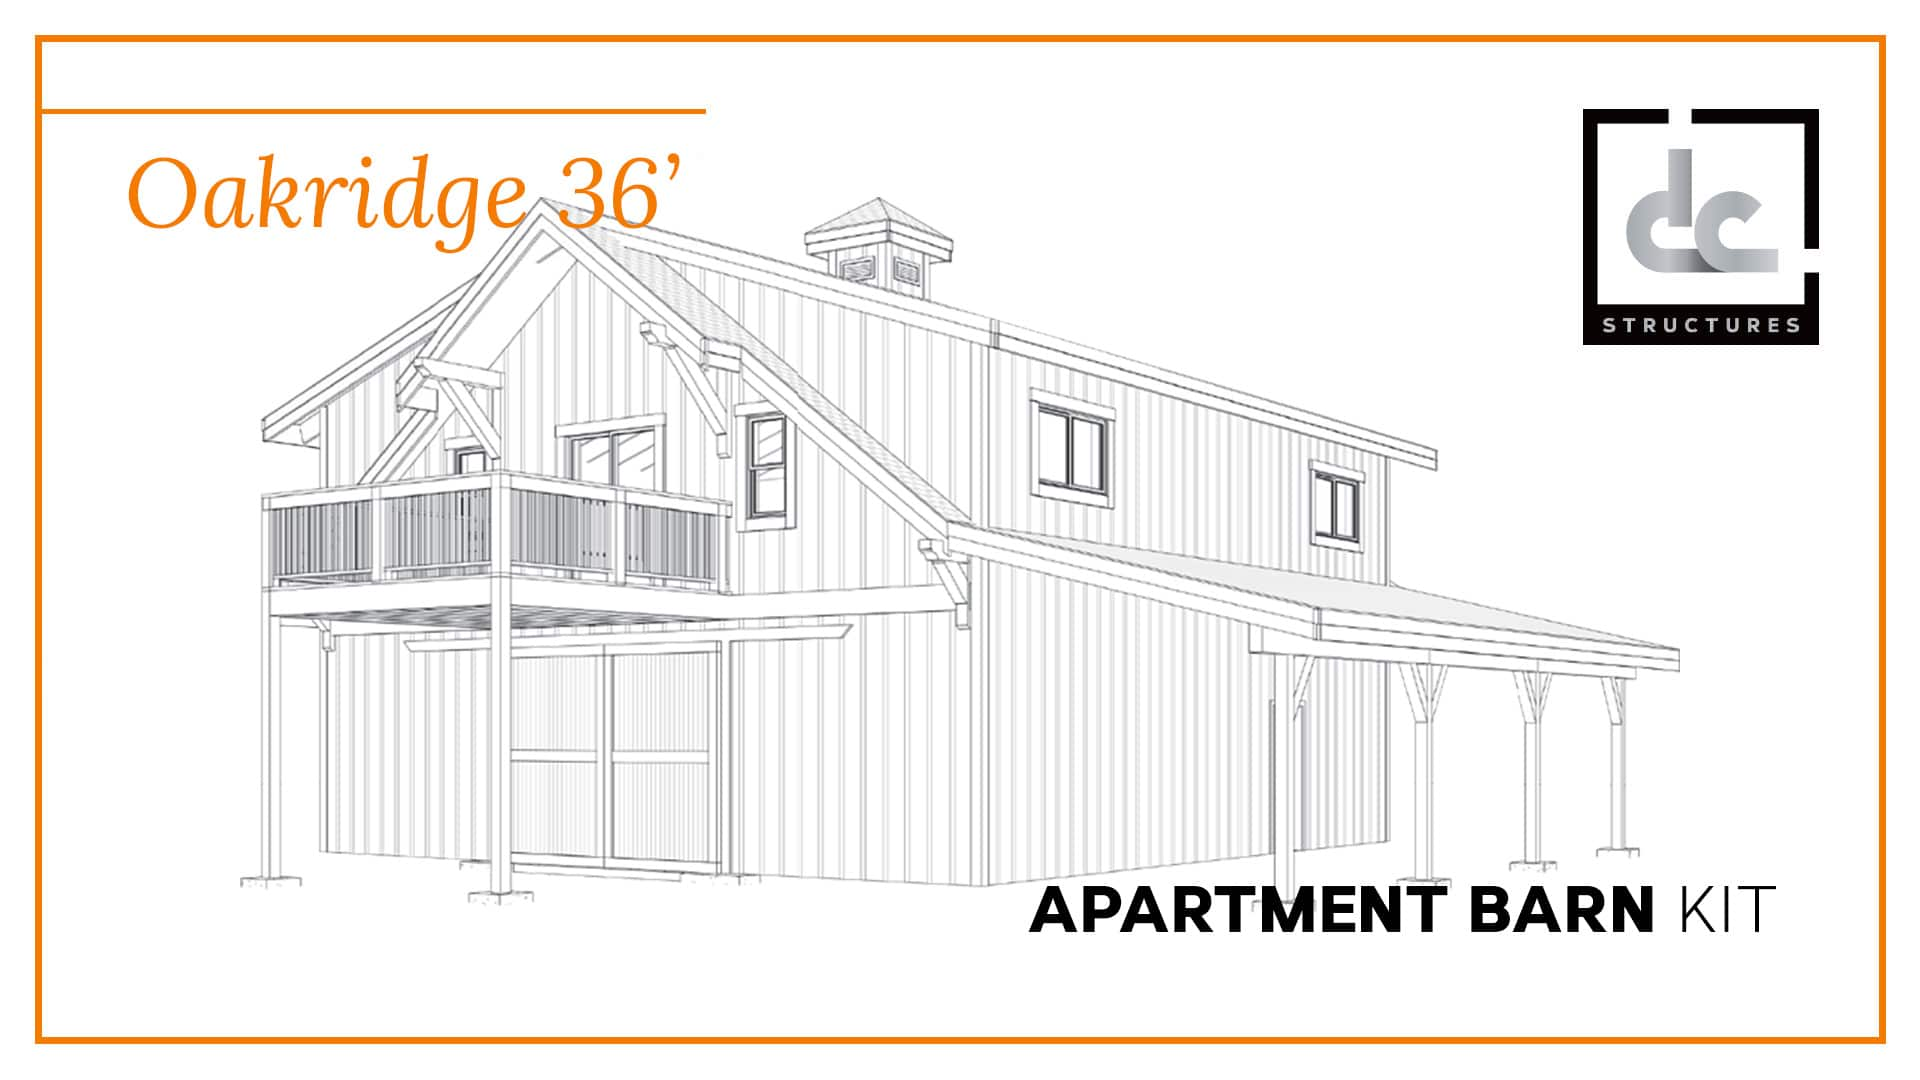 oakridge apartment barn kit 36 barn home kit dc structures starting price